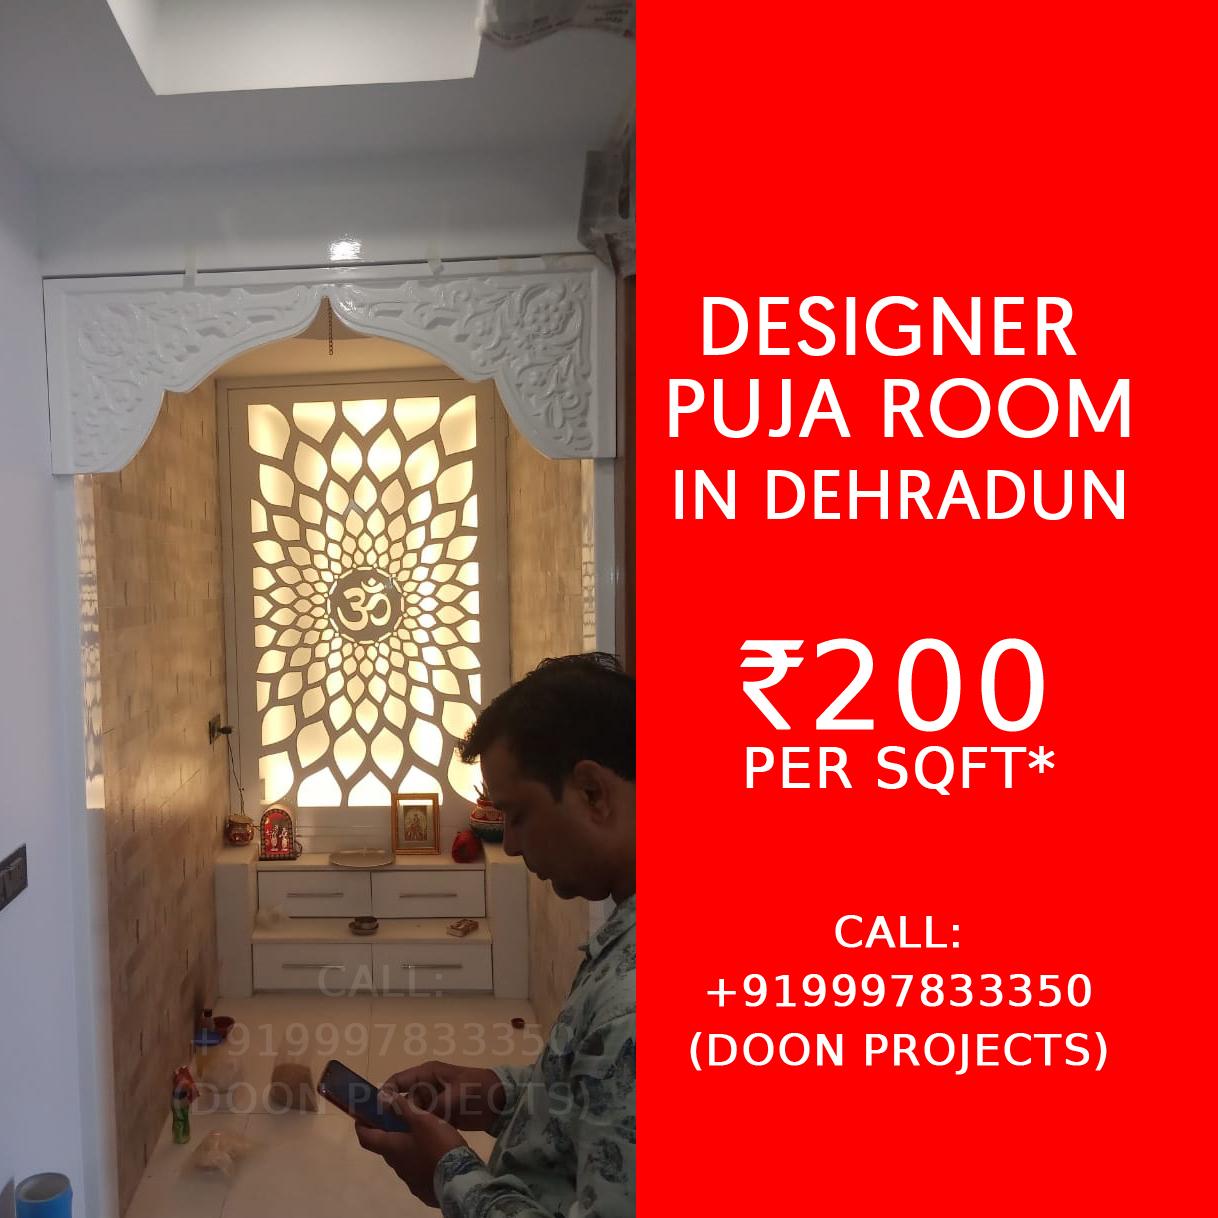 Plywood cabinets, CNC Om Jali, Duco Paint Finish, LED Lights